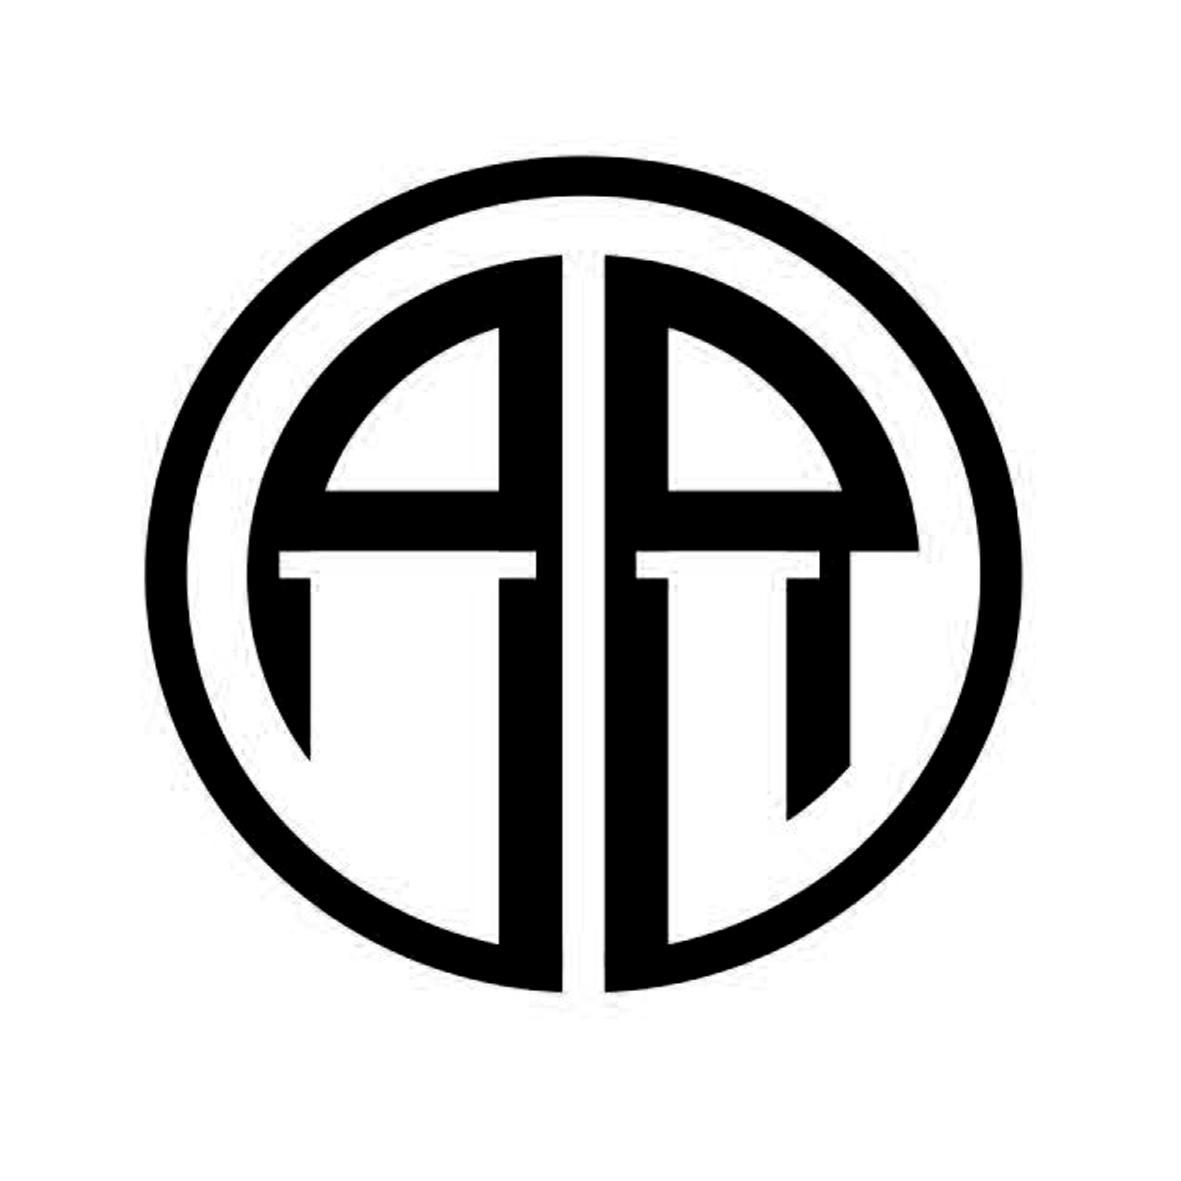 logo logo 标识 标志 设计 矢量 矢量图 素材 图标 1181_1181